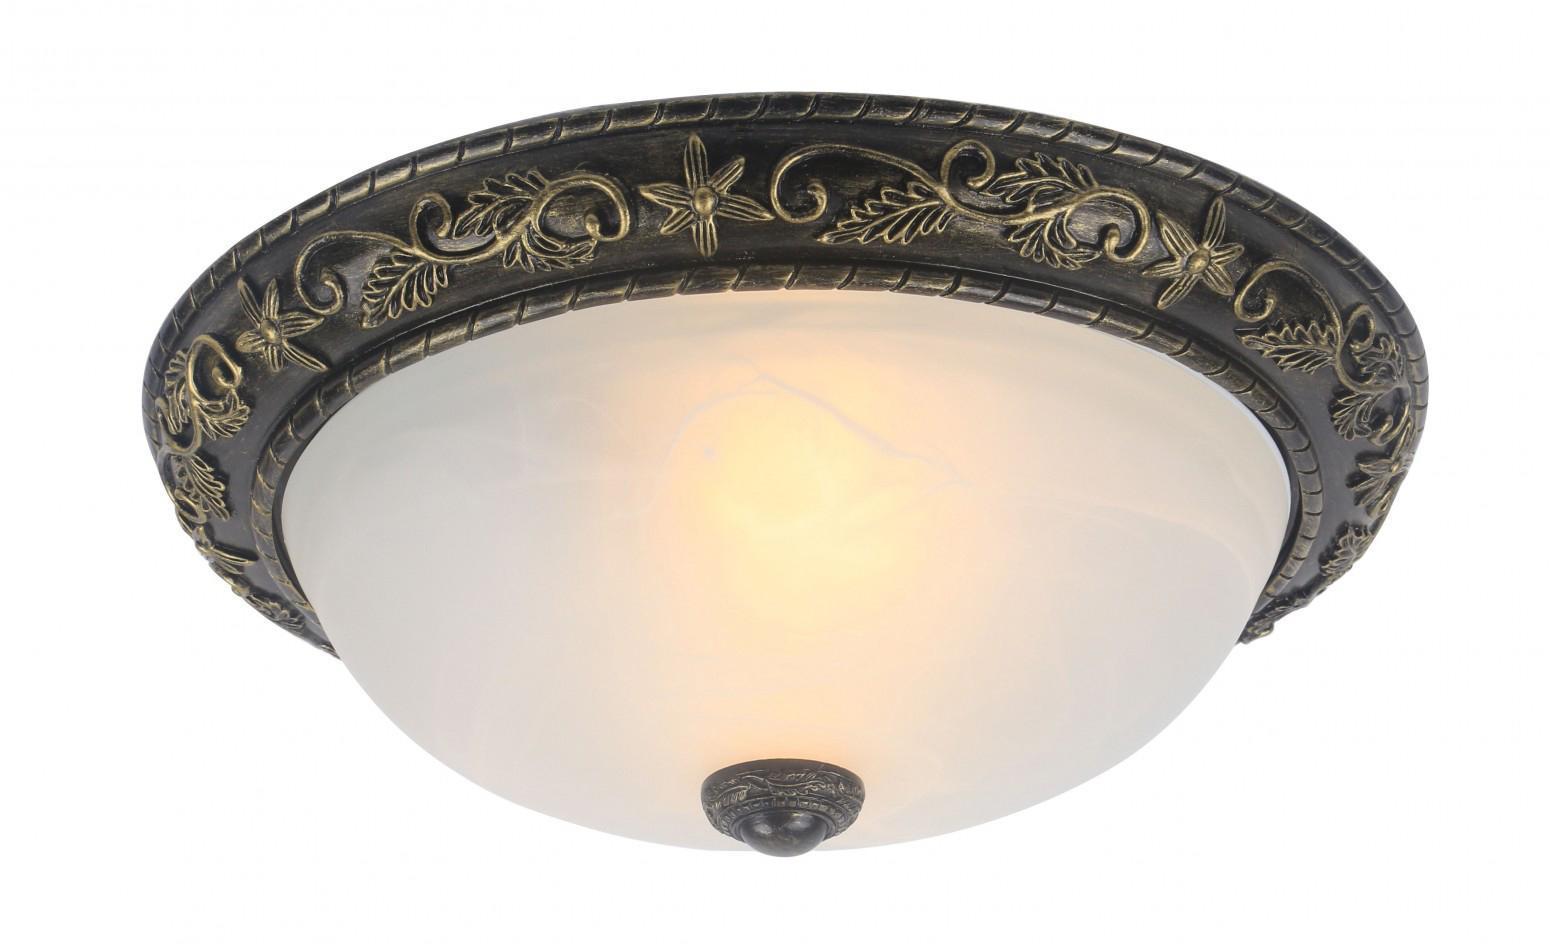 A7162PL-2AB TORTA Потолочный светильник pl ip8 tsled 1 2 gn